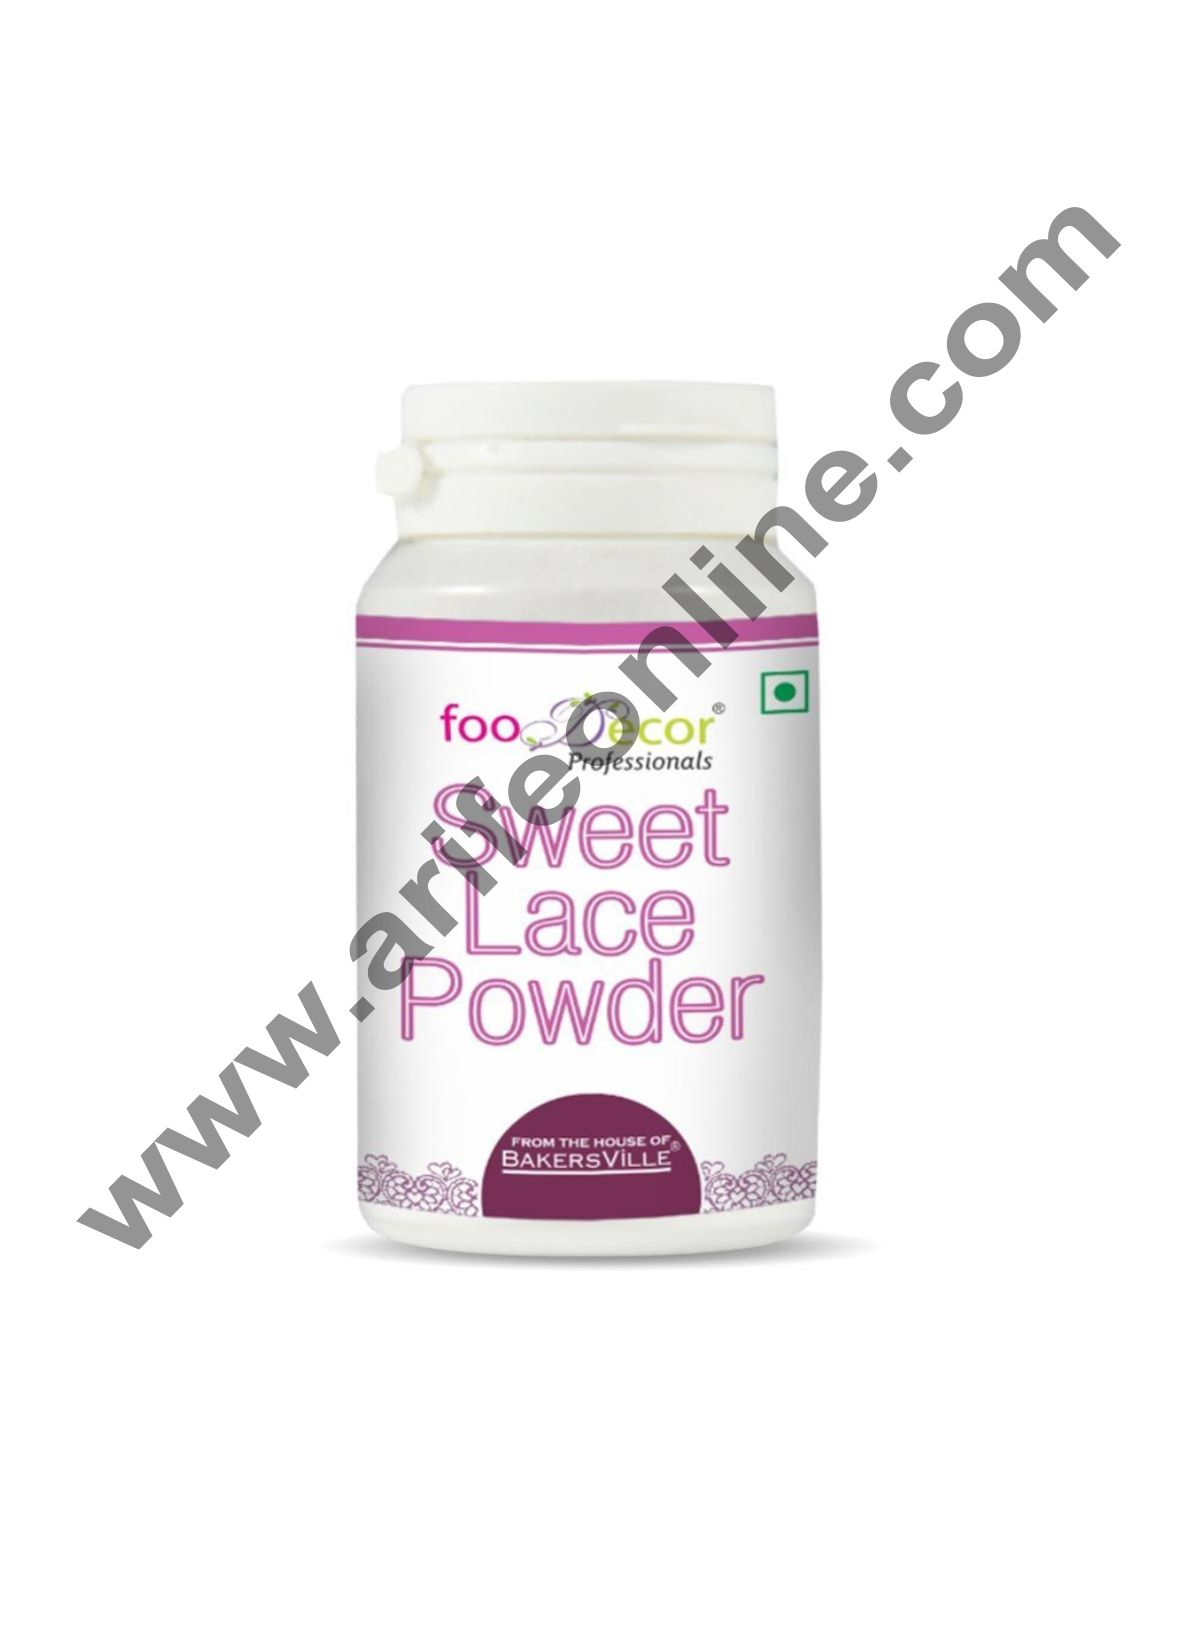 FooDecor Sweet Lace Powder, (75gm)